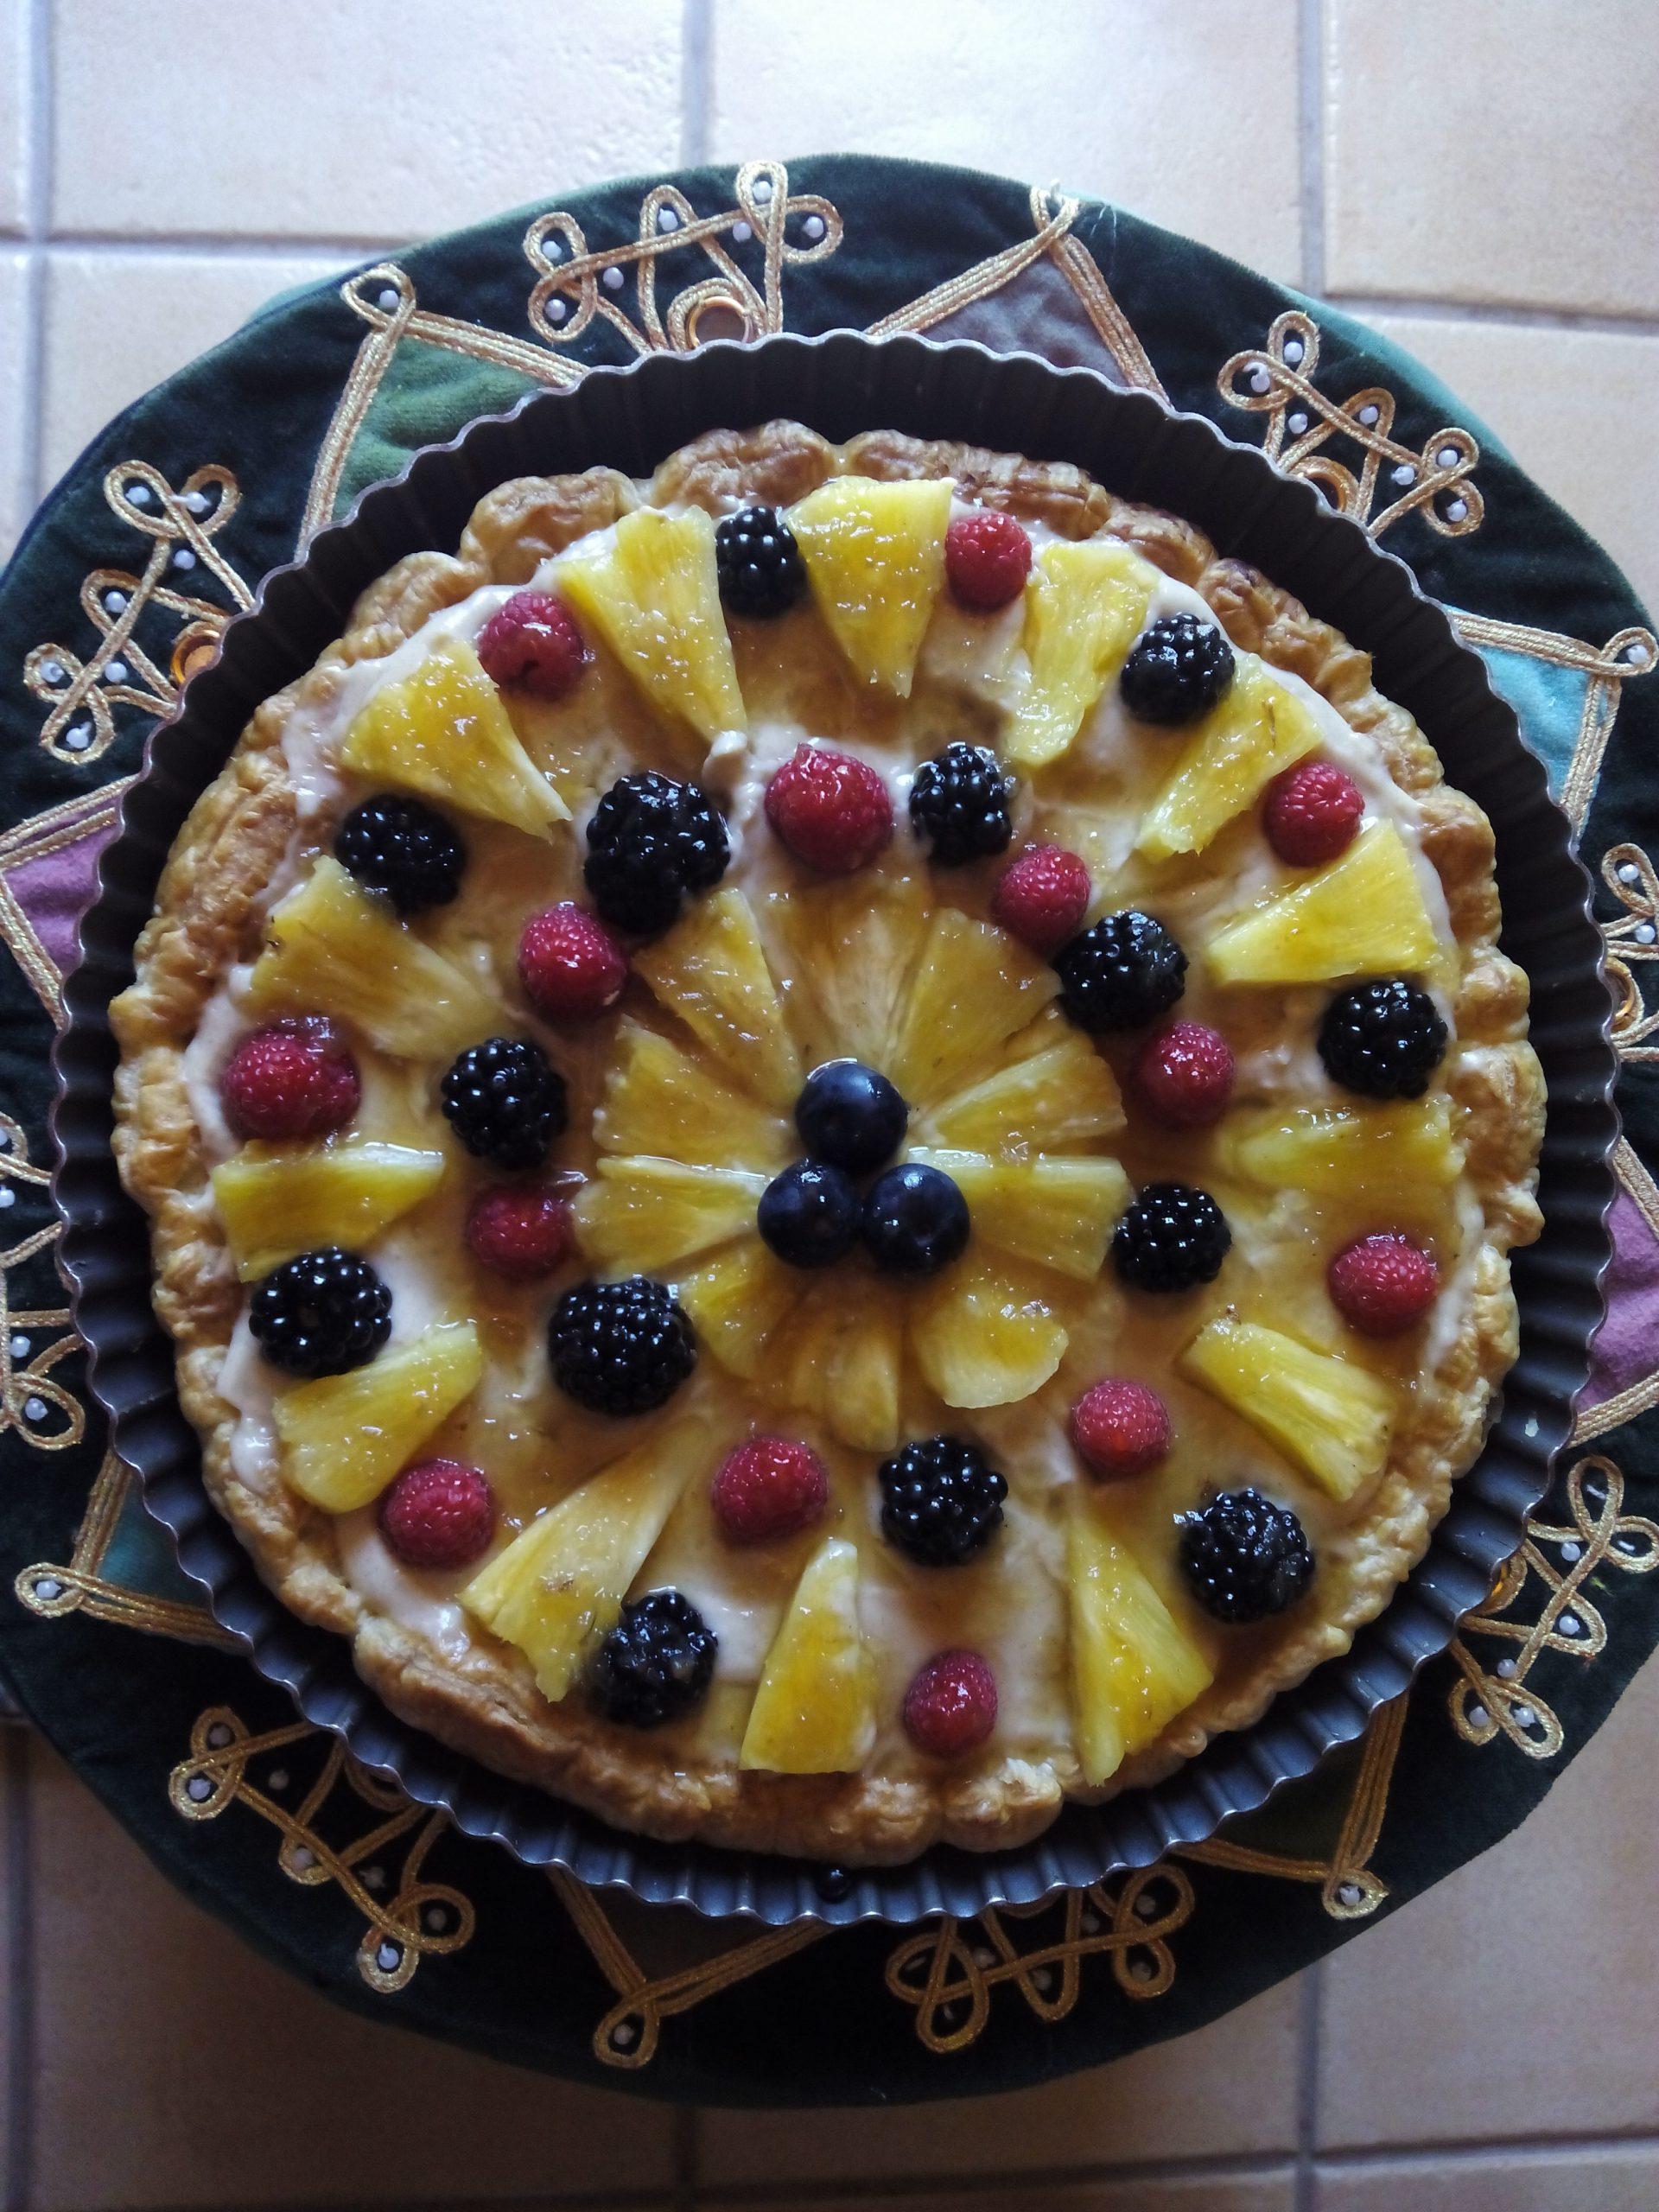 Pastís de fruites